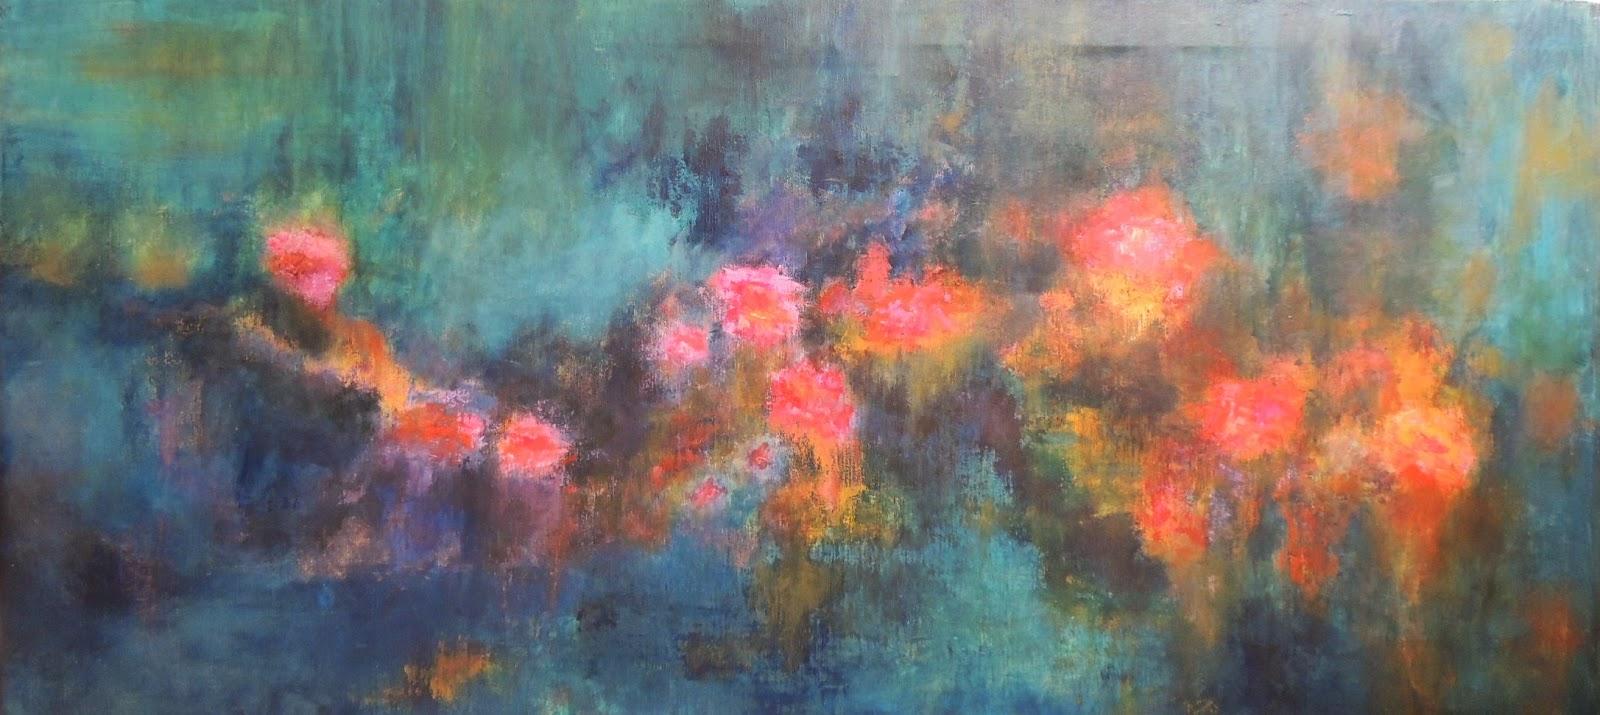 Maryse artiste peintre abstraits de 2012 2014 for Peintres abstraits